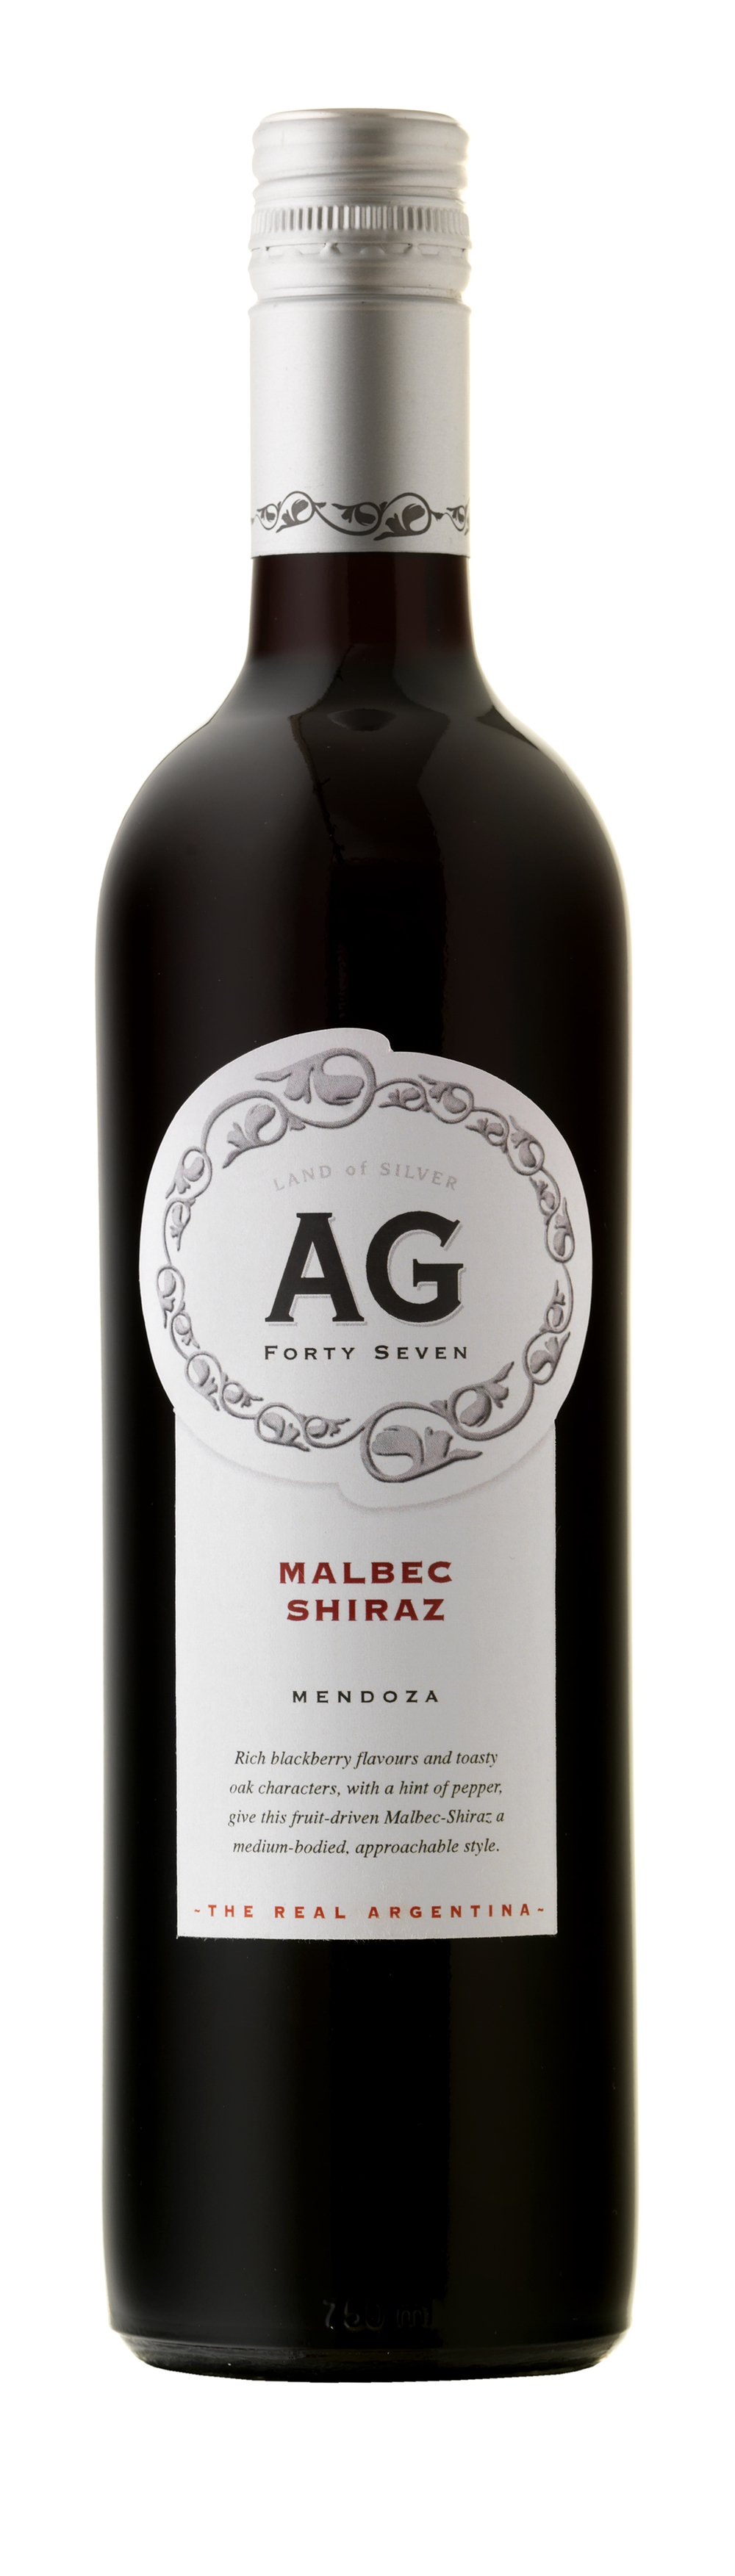 6 AG47-Malbec-Shiraz.jpg